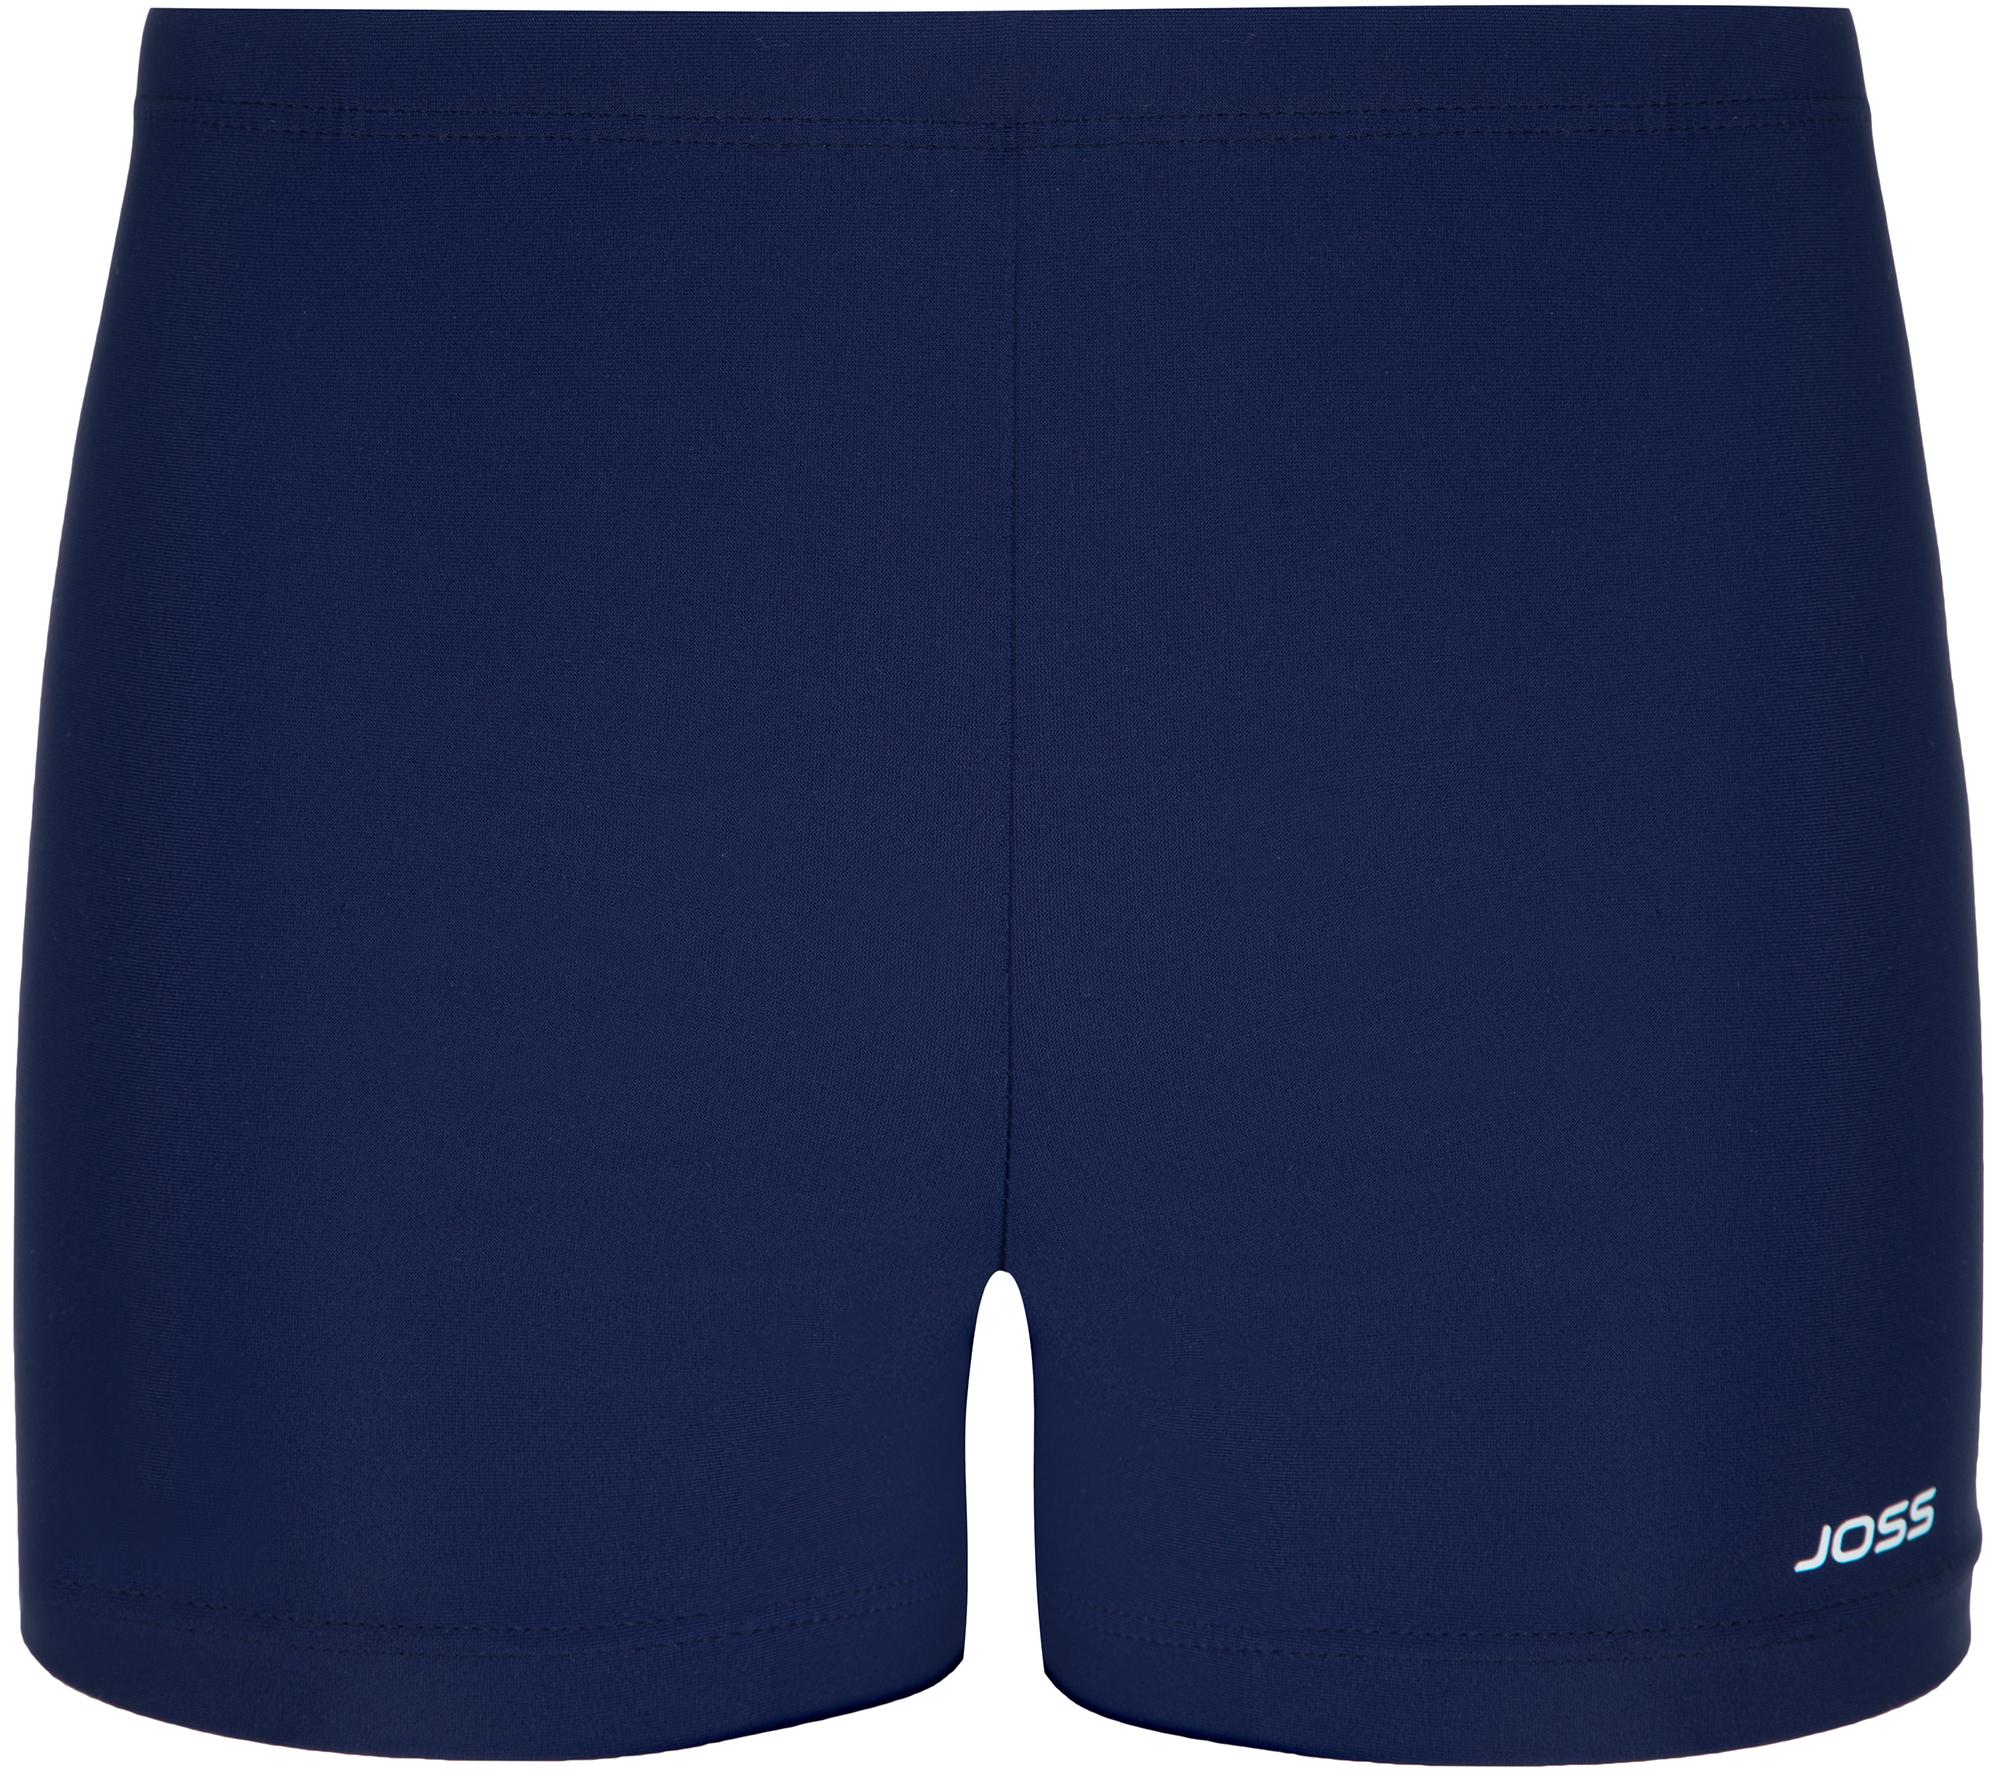 Joss Плавки-шорты для мальчиков Joss, размер 116 joss плавки для мальчиков joss размер 128